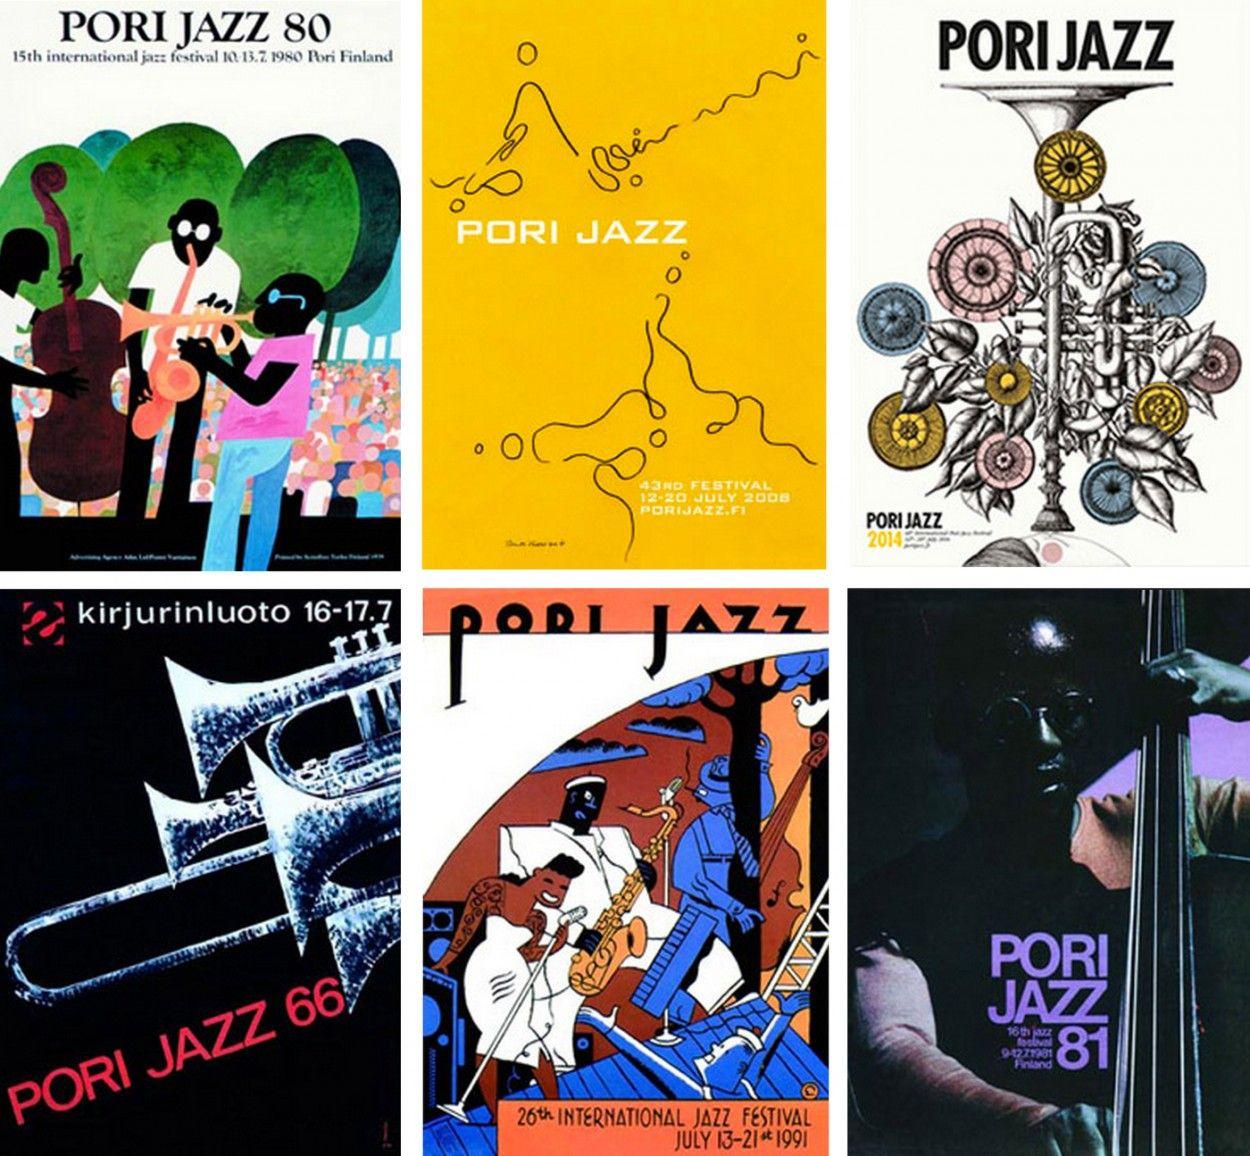 pori-jazz-julisteet3.jpg